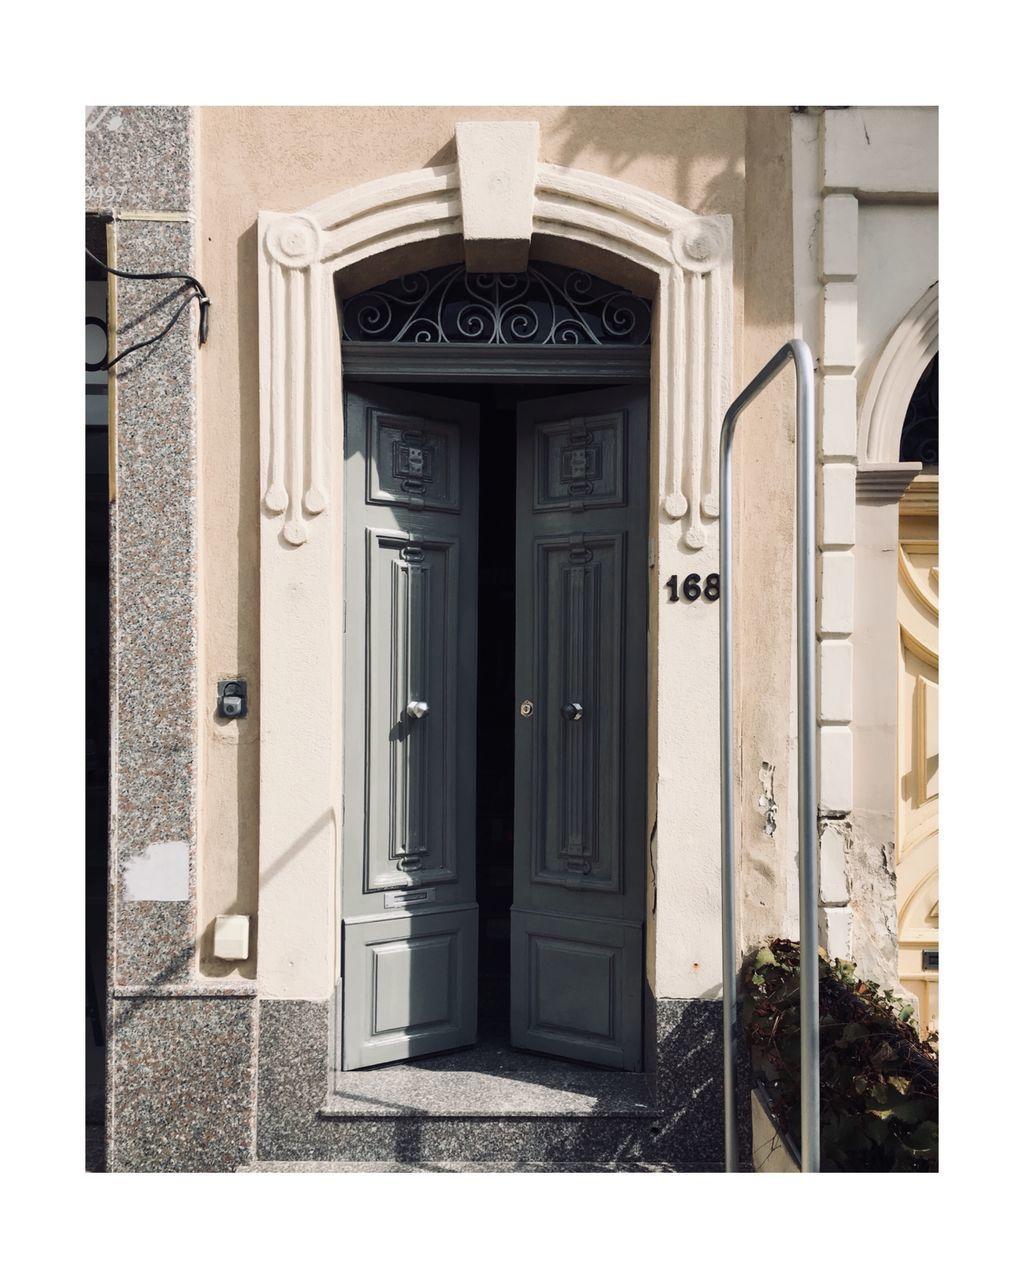 EXTERIOR OF CLOSED DOORS